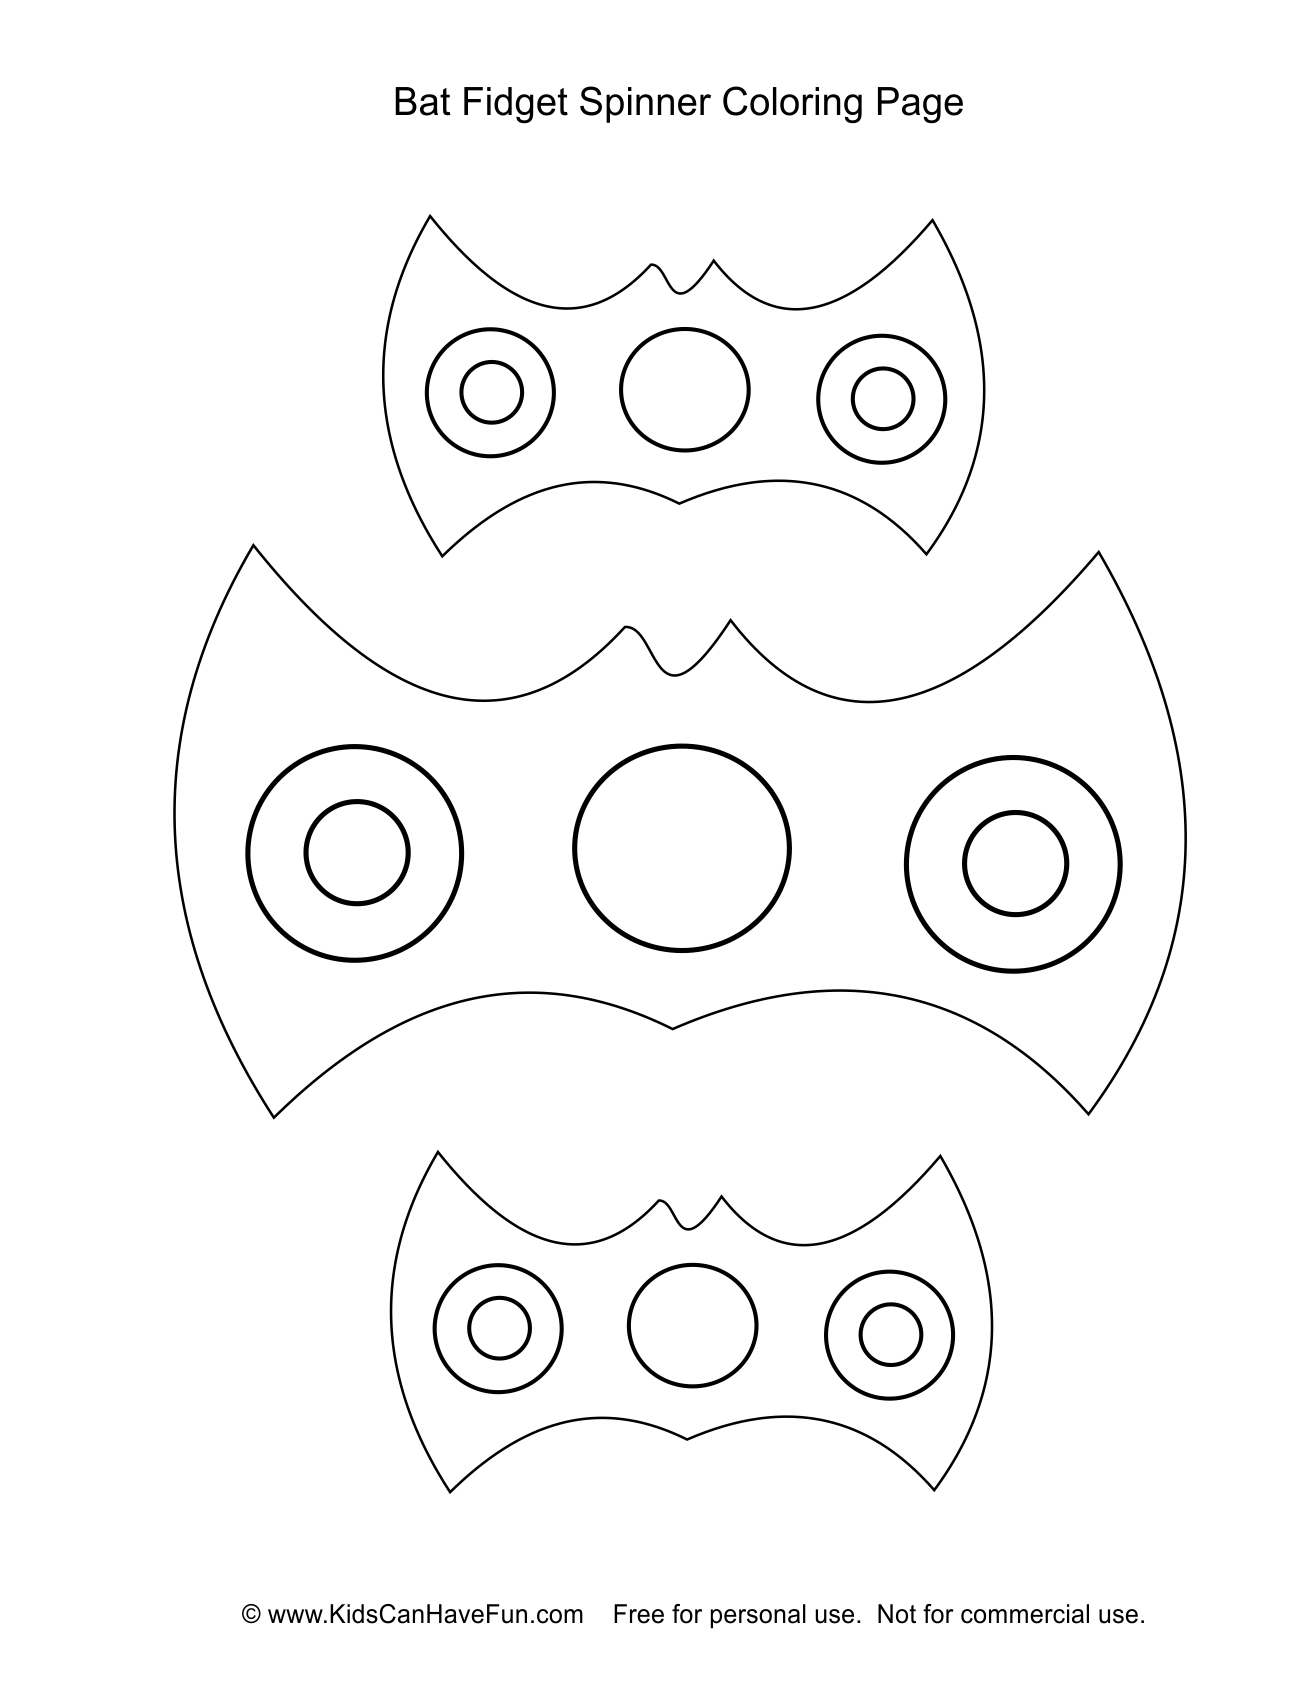 Bat Fidget Spinner Coloring Page Dscanhavefun